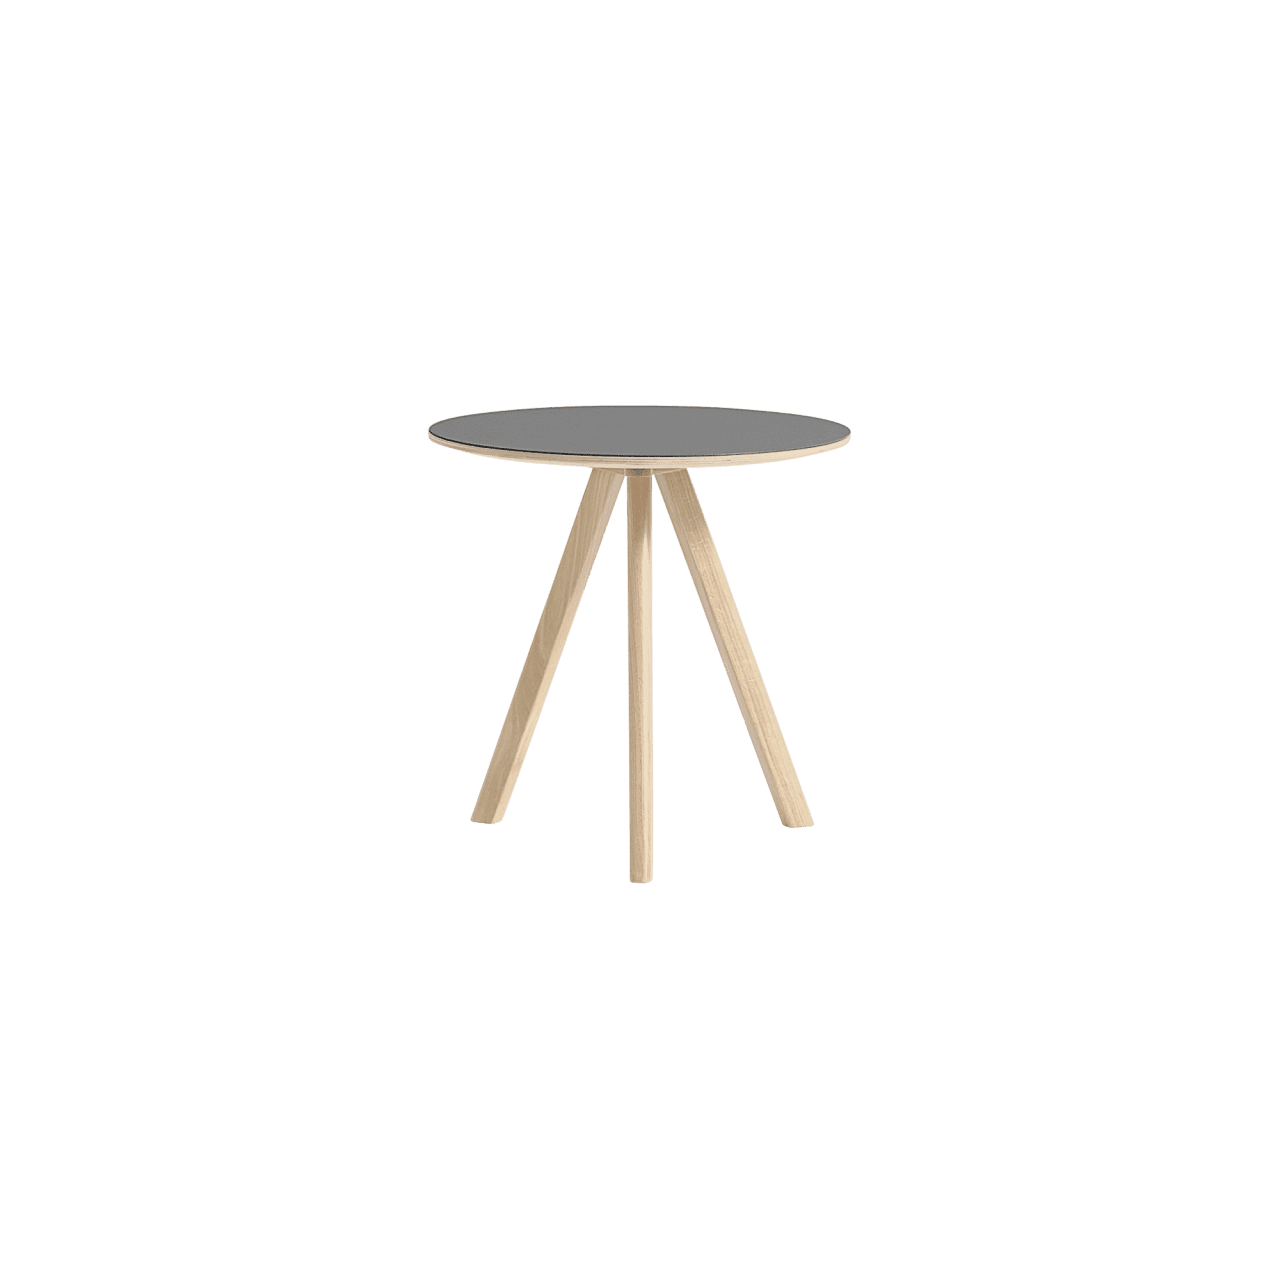 Copenhague Tisch Beistelltisch